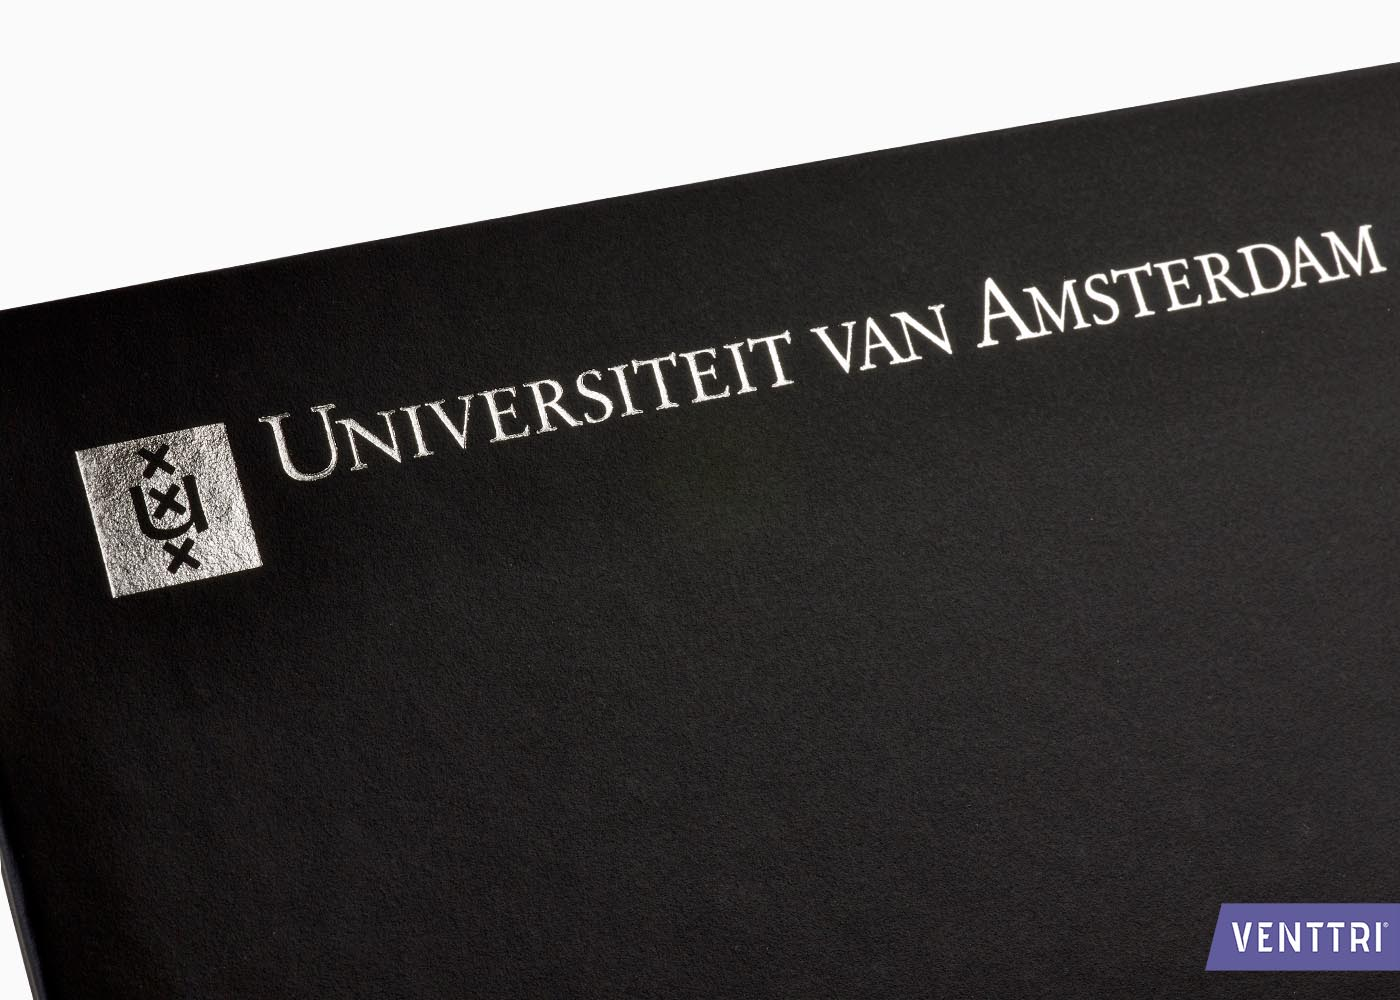 Diplomamap met foliedruk zilver